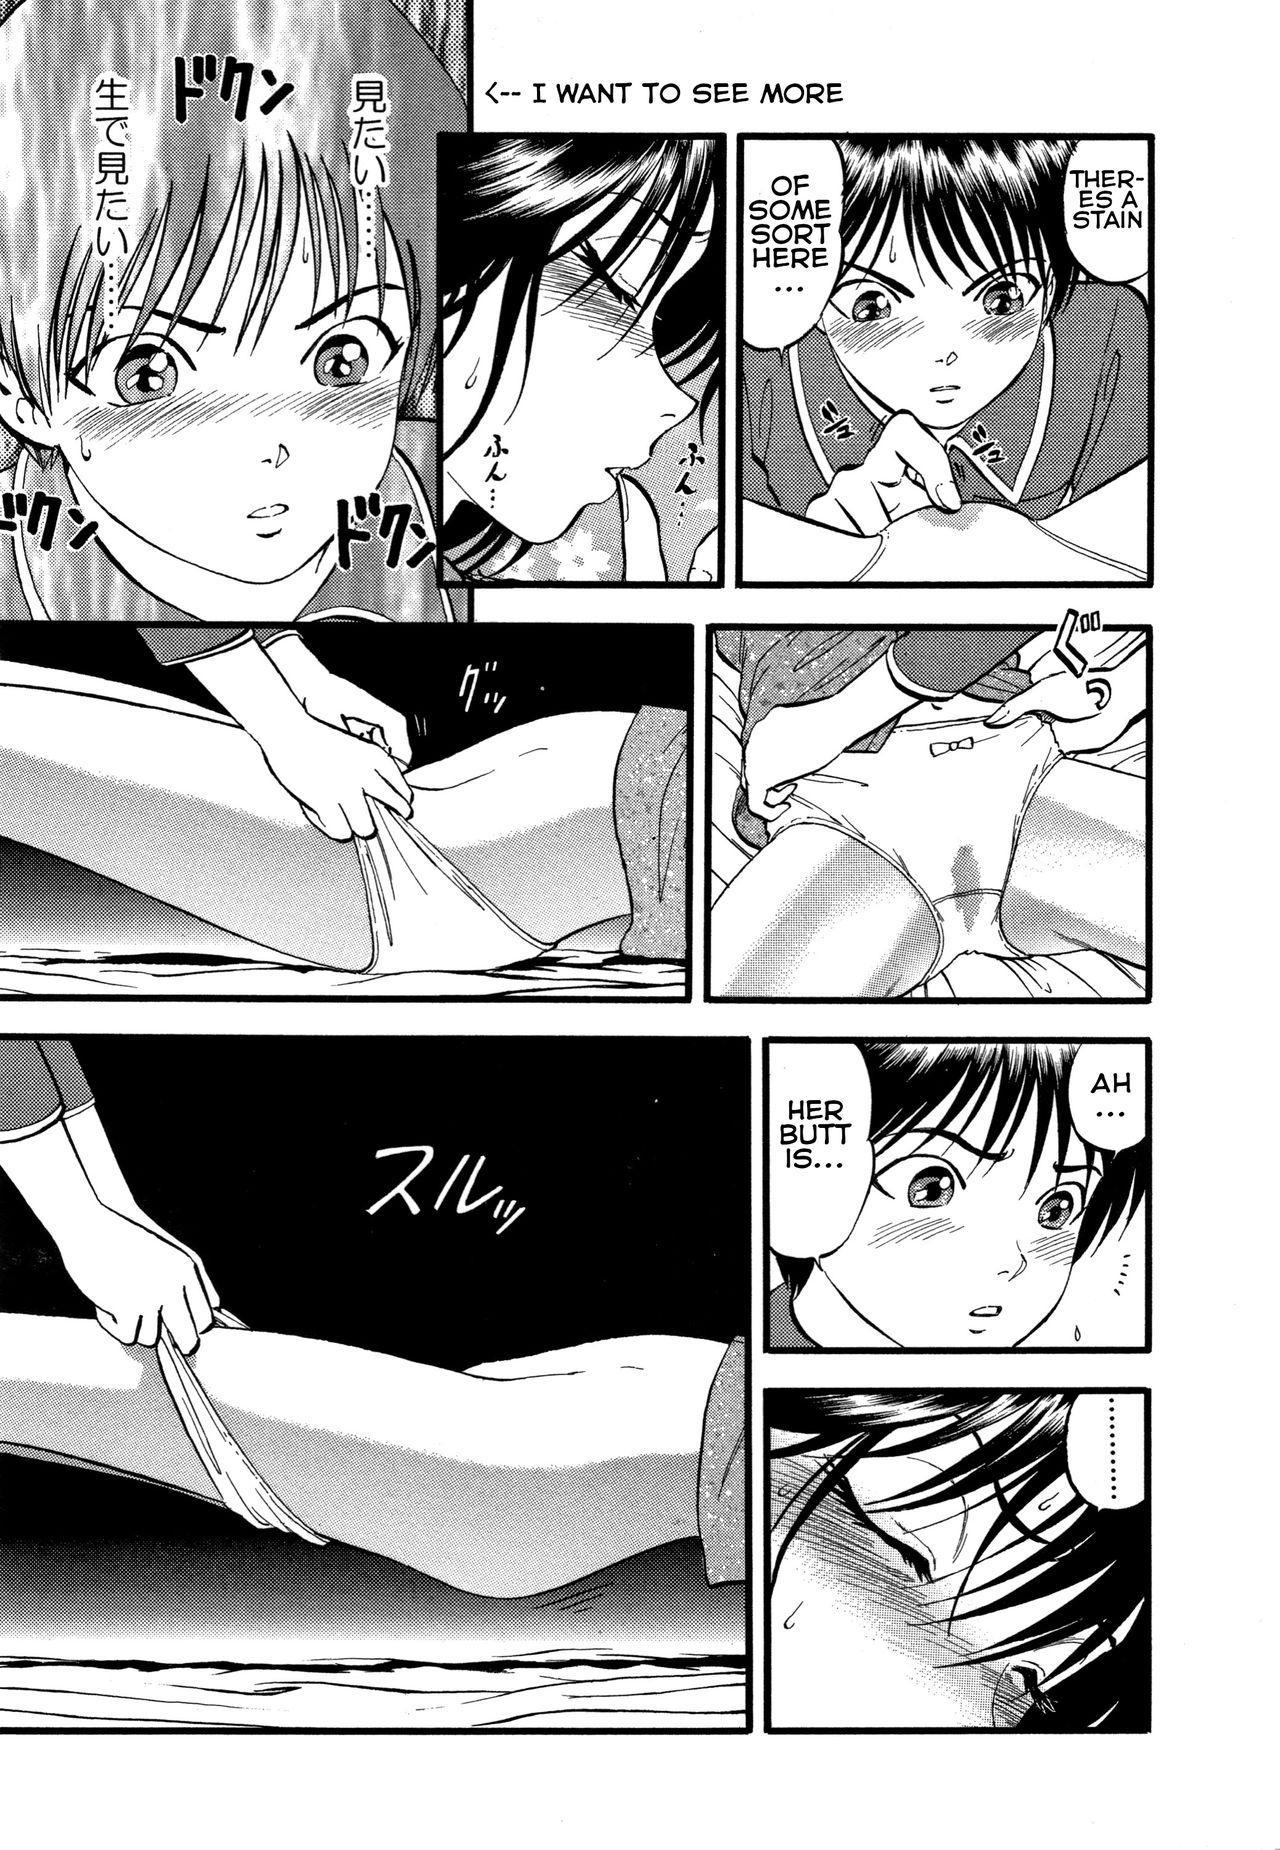 [RPG Company 2 (Yoriu Mushi)] R-Shitei Play 1 - Little Night Crawling [English] 11